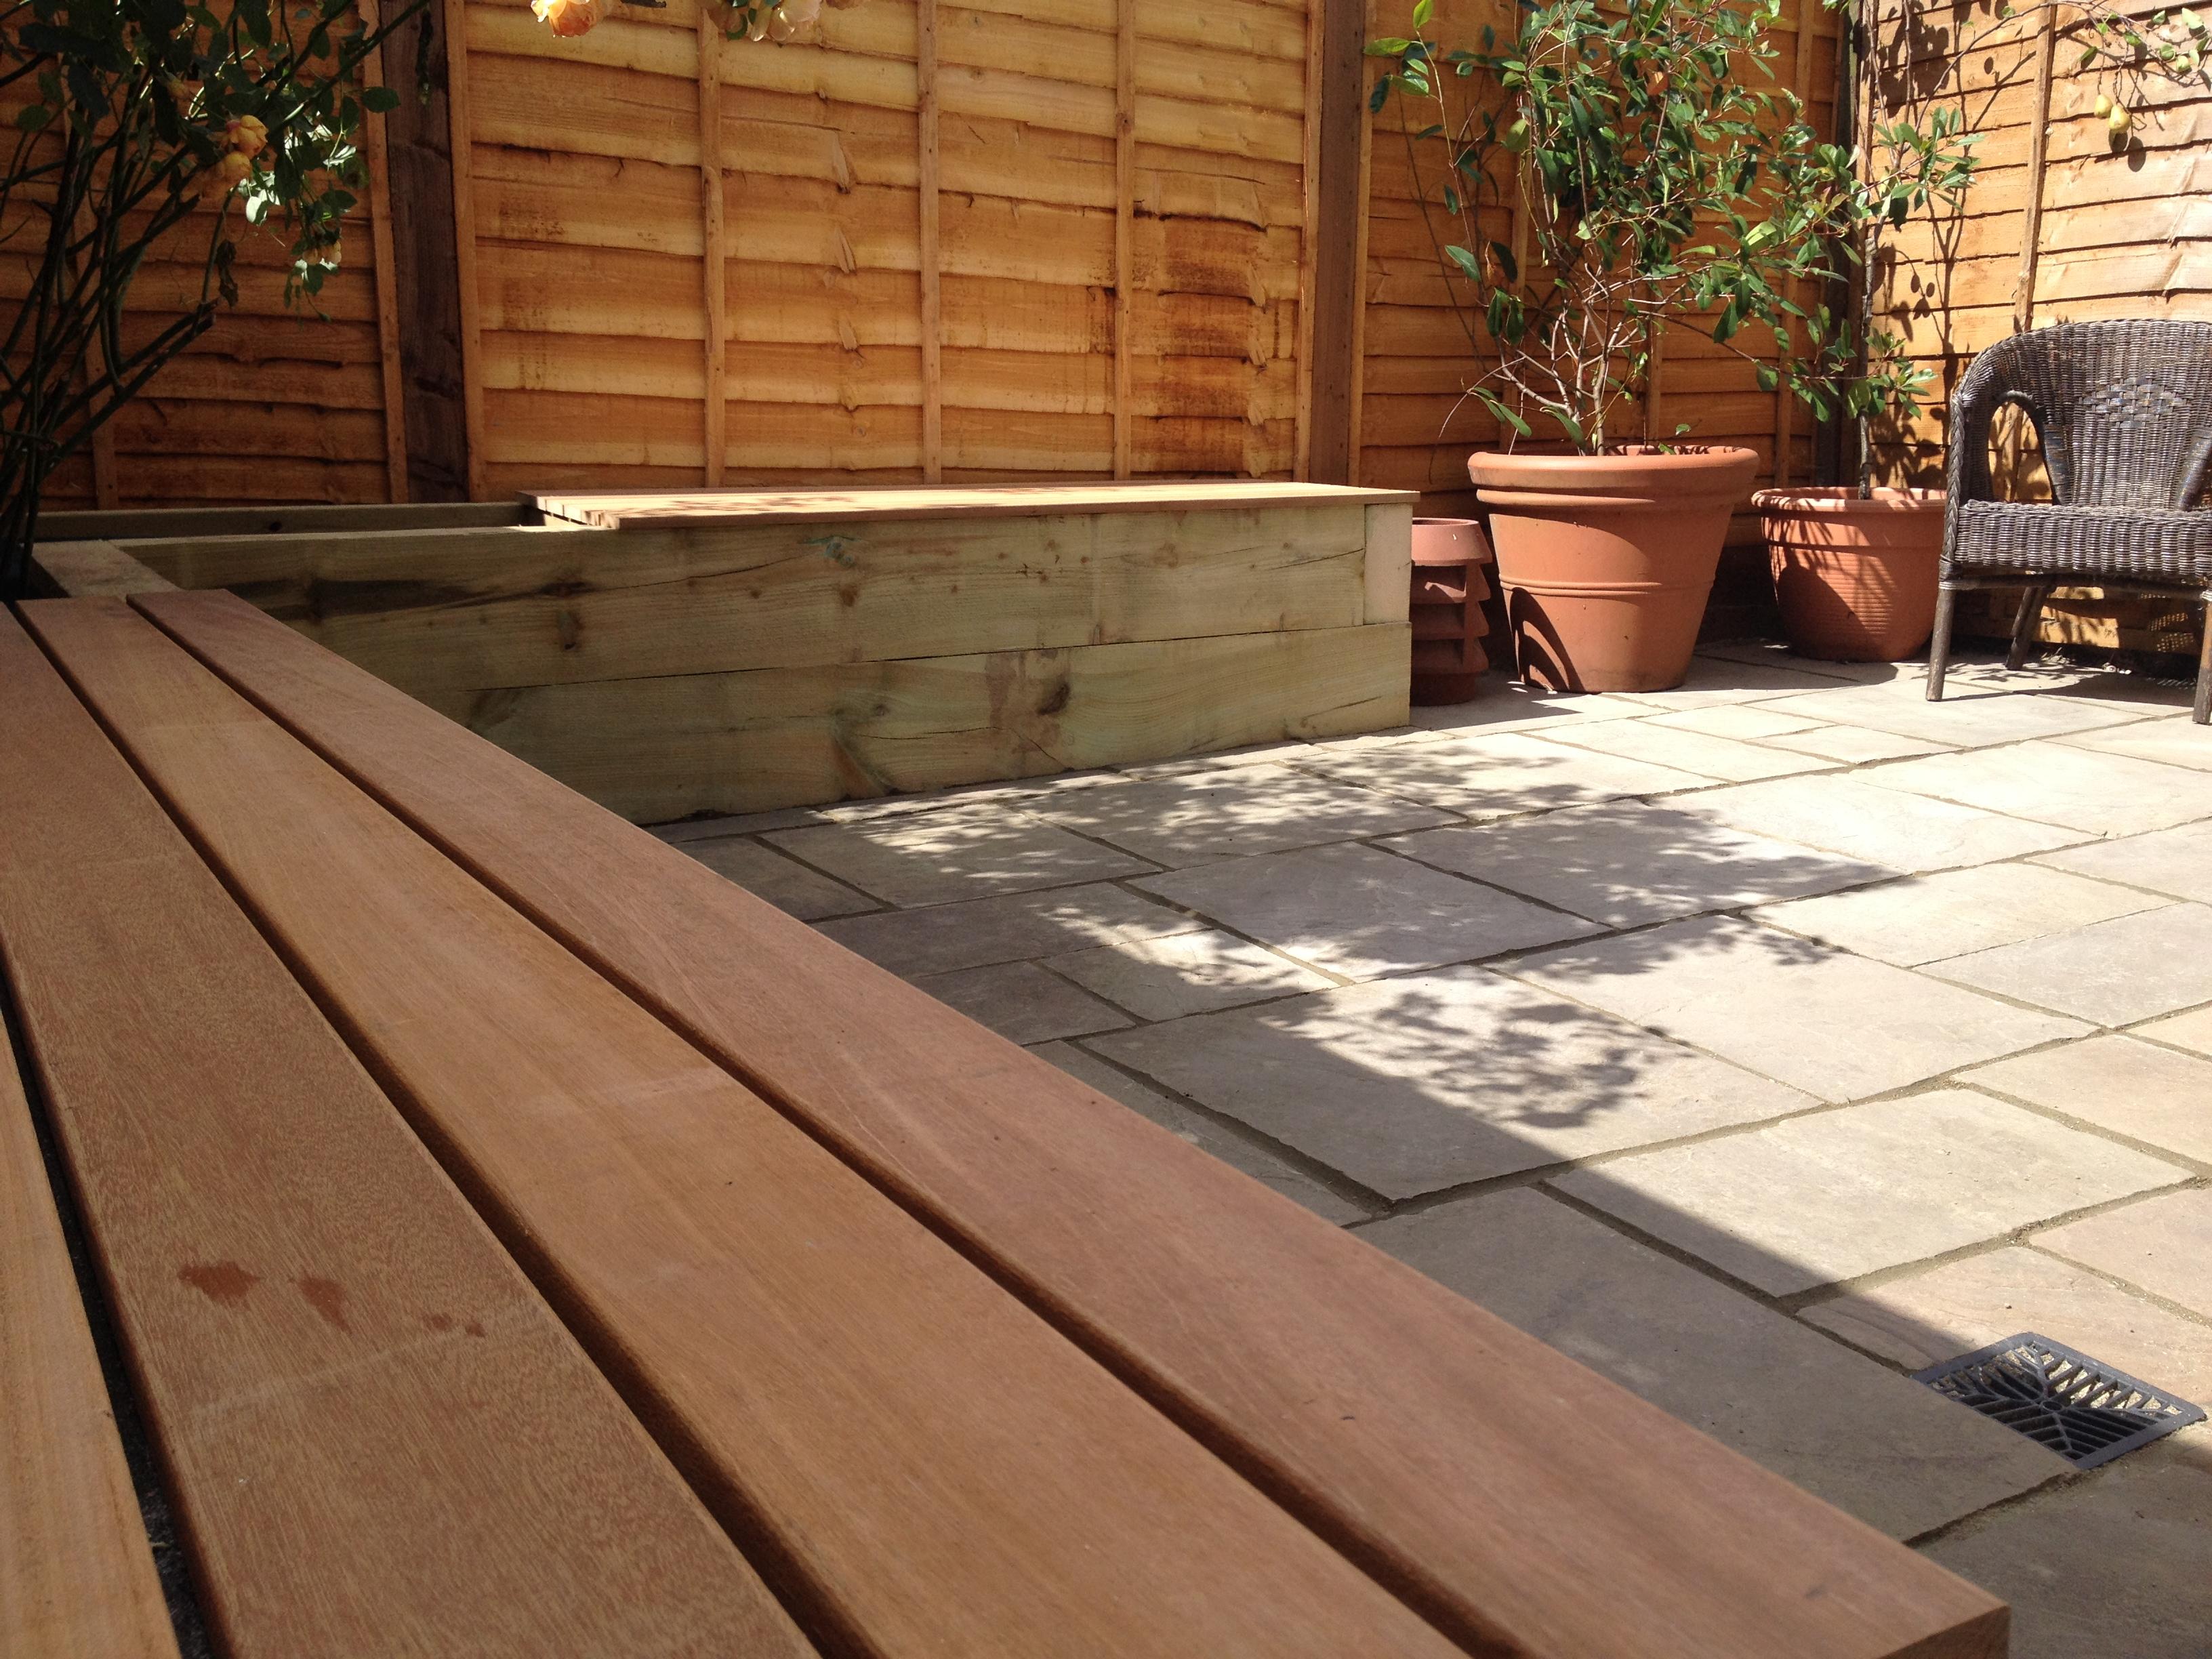 Forest Hill Garden design service, London landscape gardener